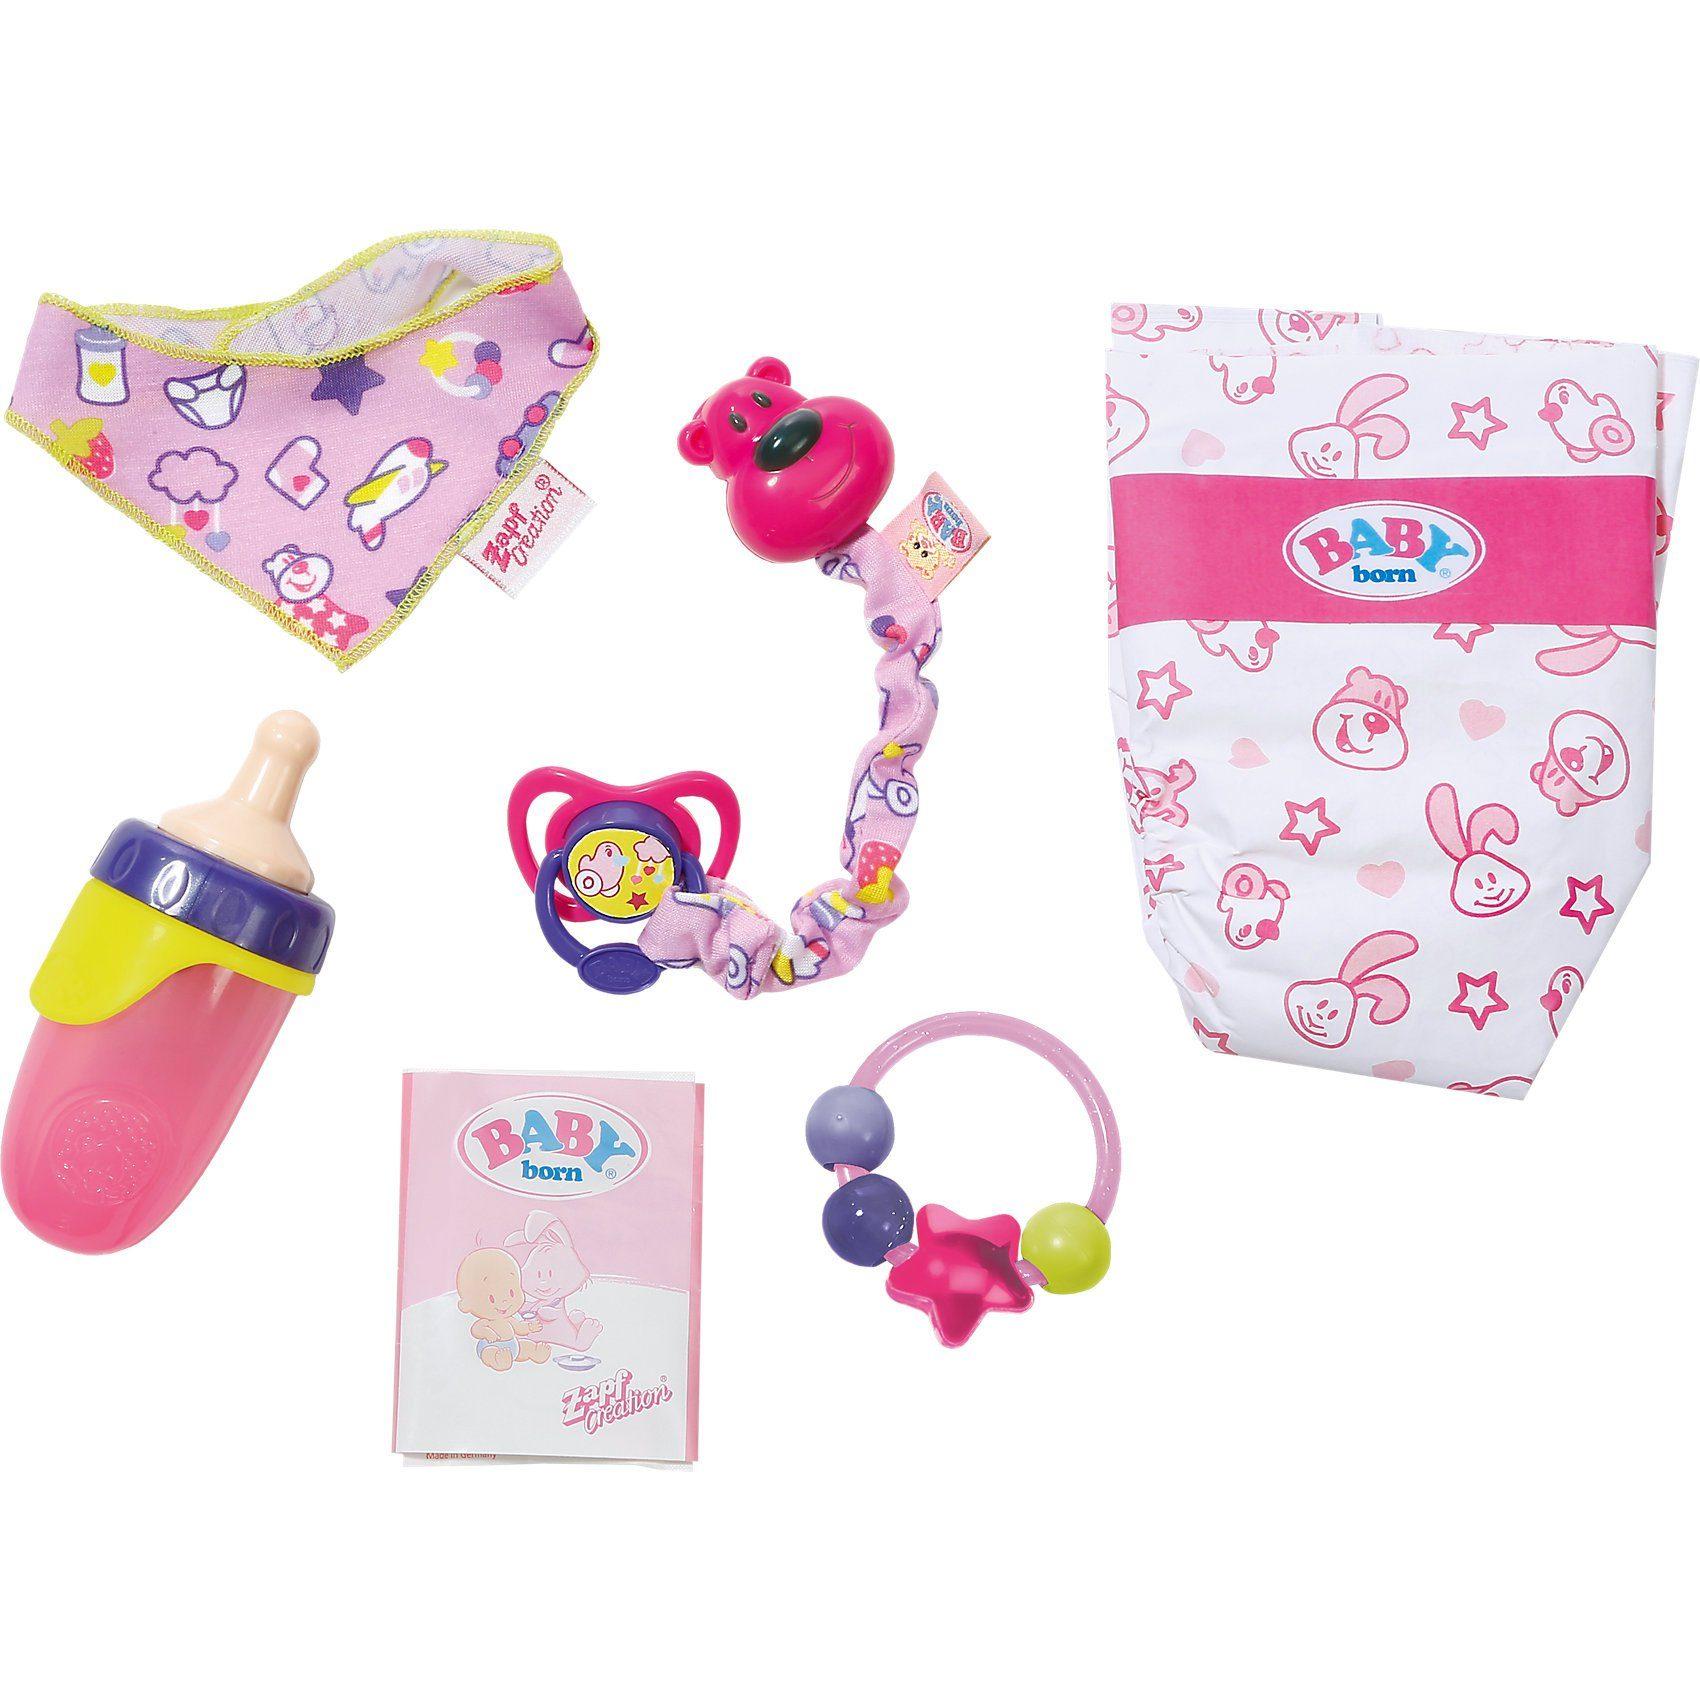 Zapf Creation® BABY born® Basic Starter Set